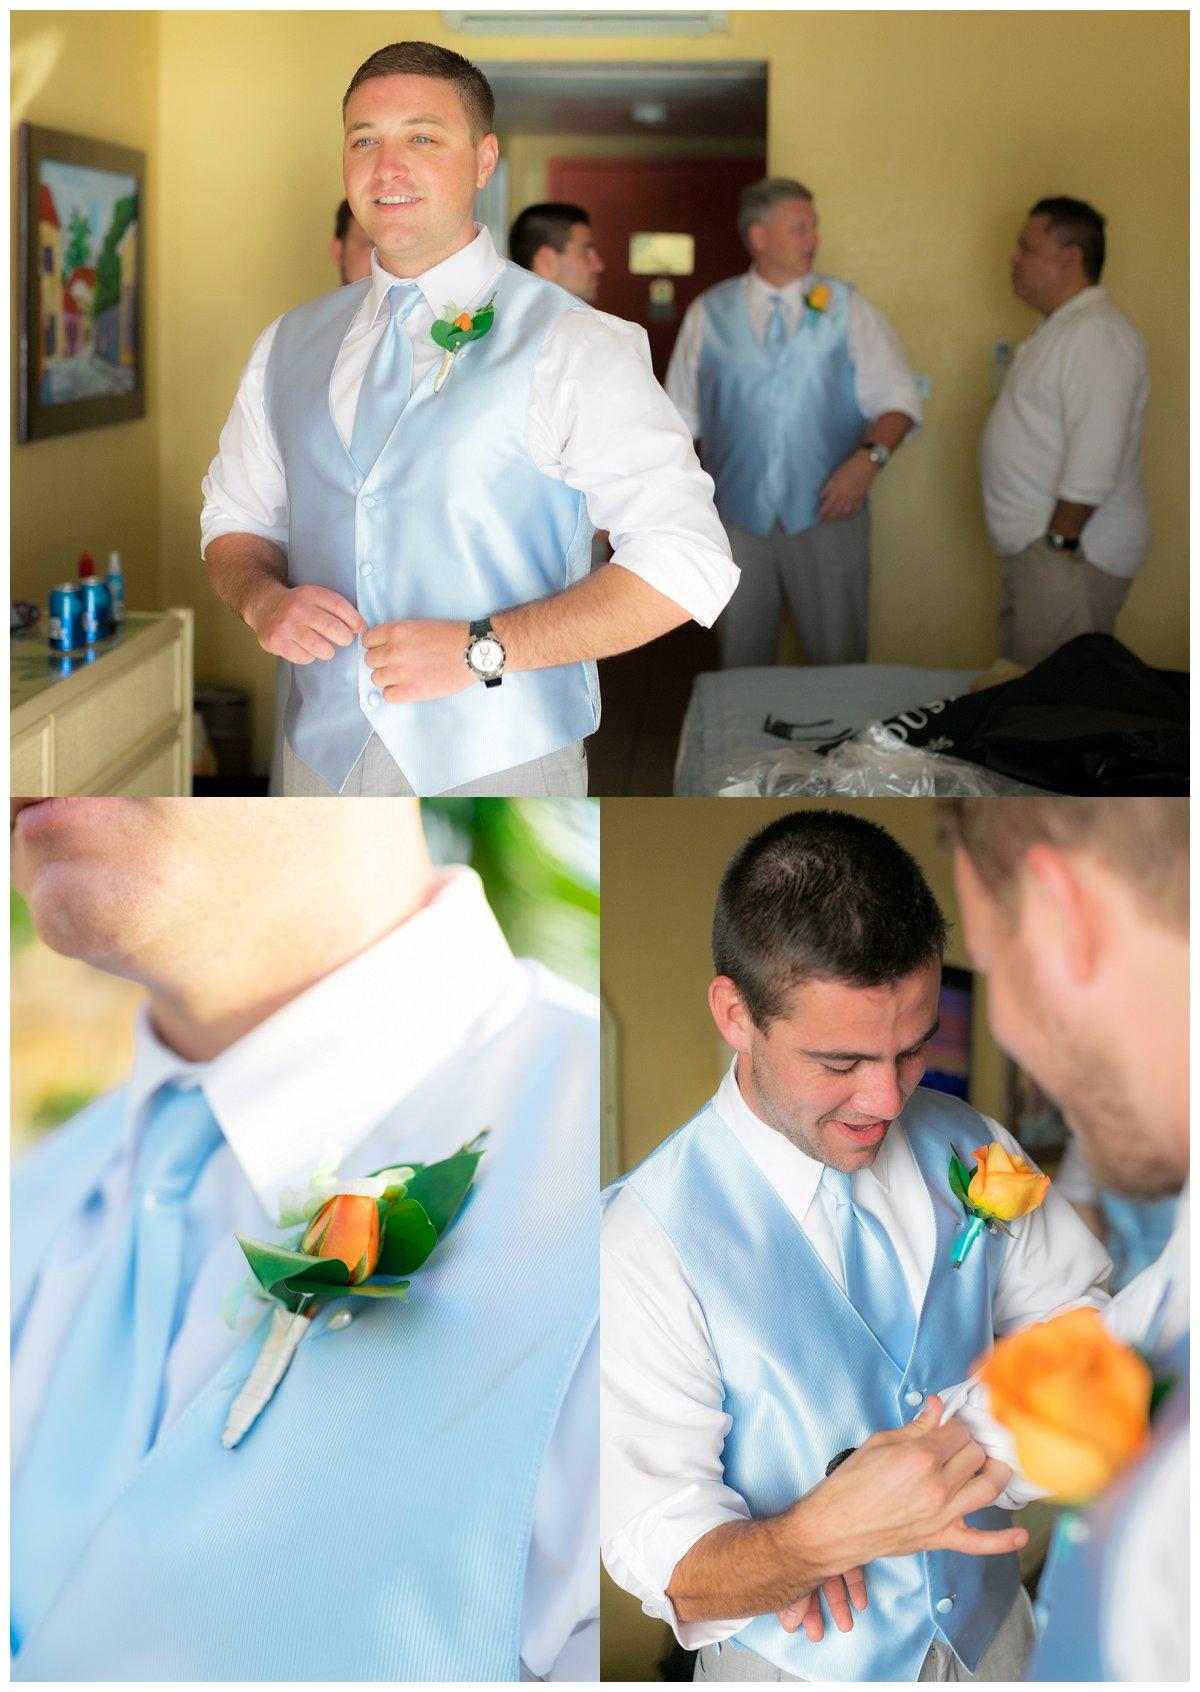 st-thomas-beach-wedding-groom-attire